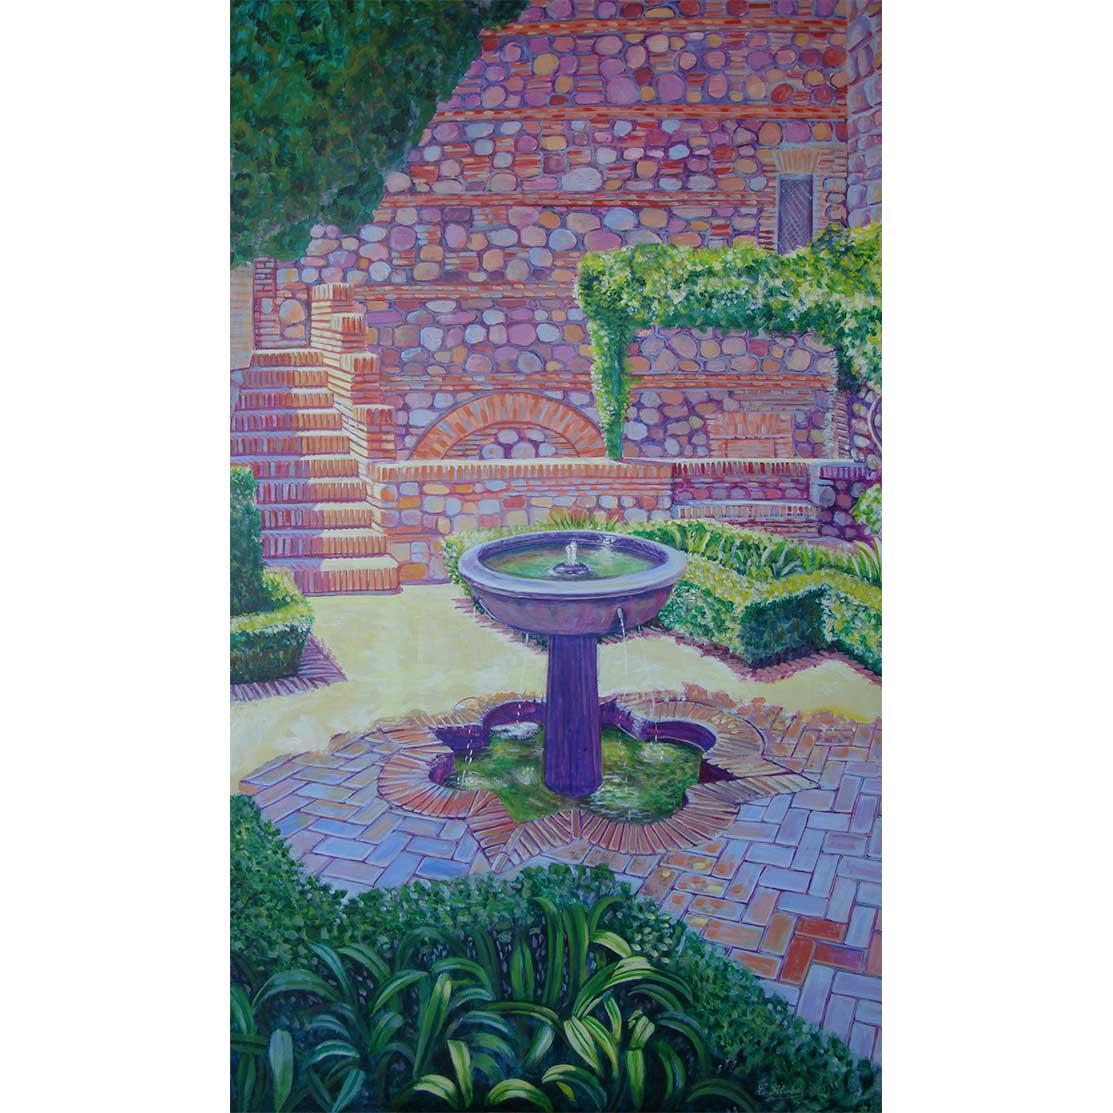 FOUNTAIN´S BABLING Acrylic on panel 139 x 80 cm